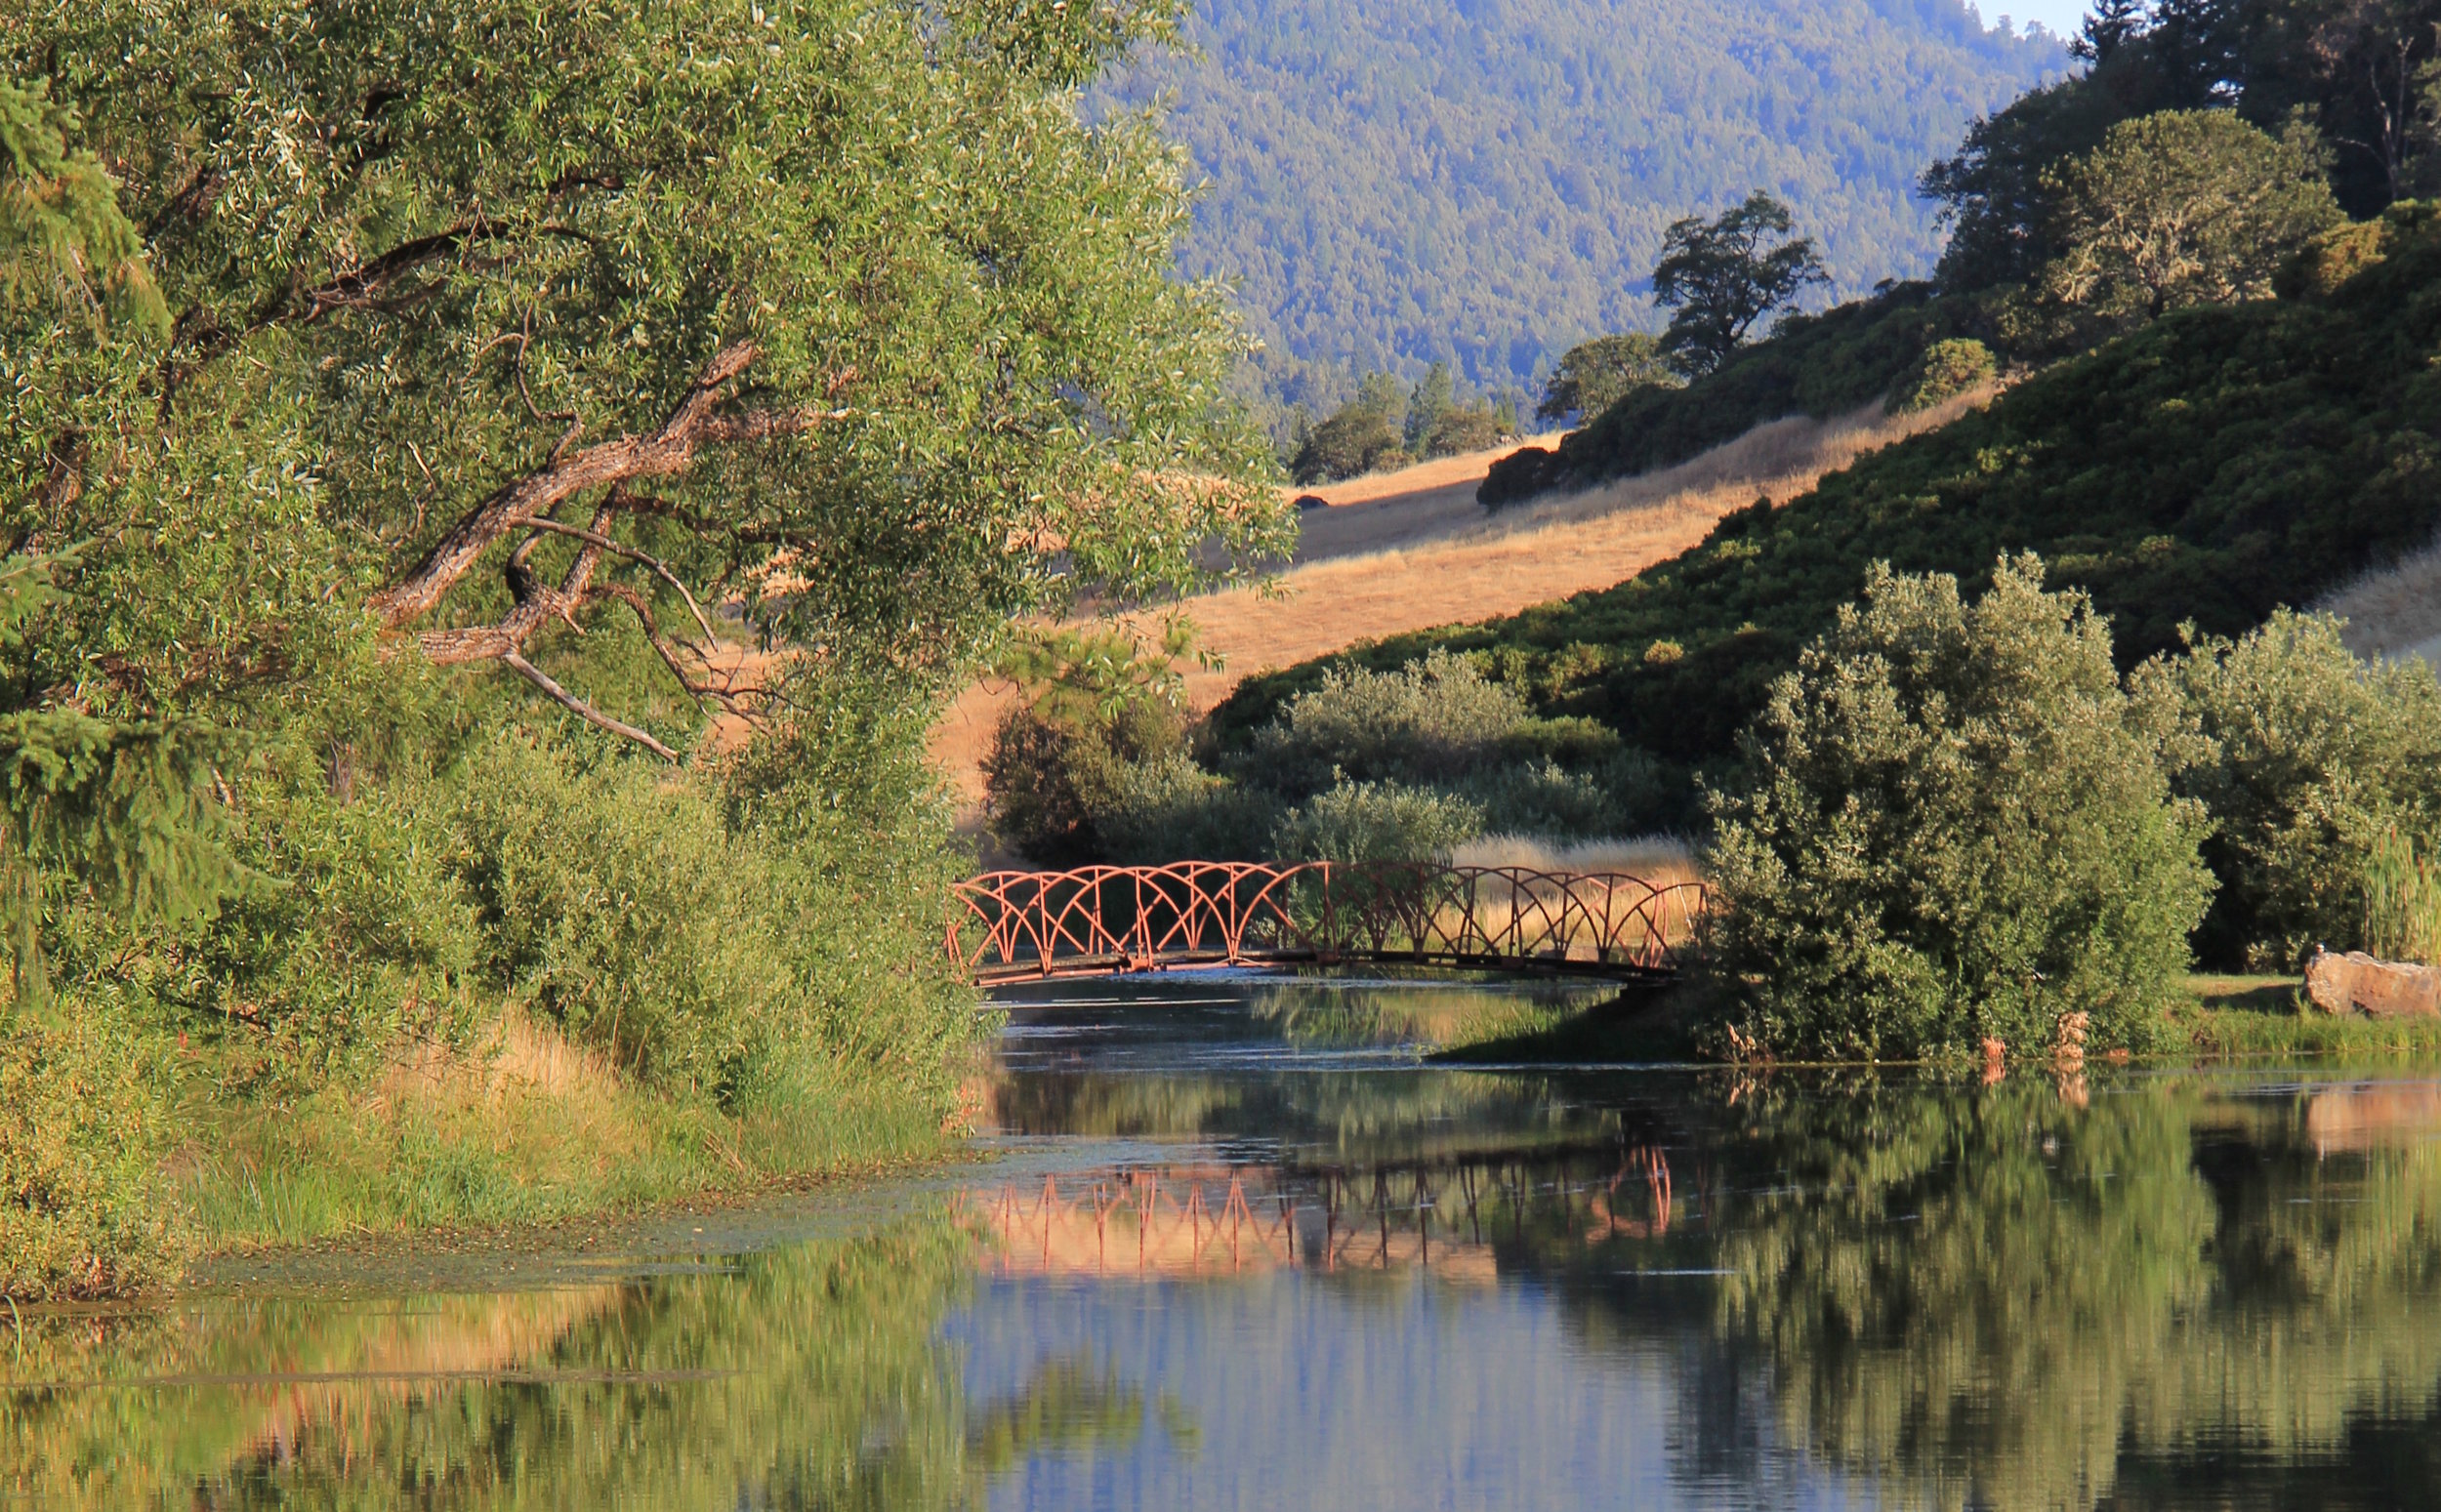 Stroll across the bridge to Big Pond's island